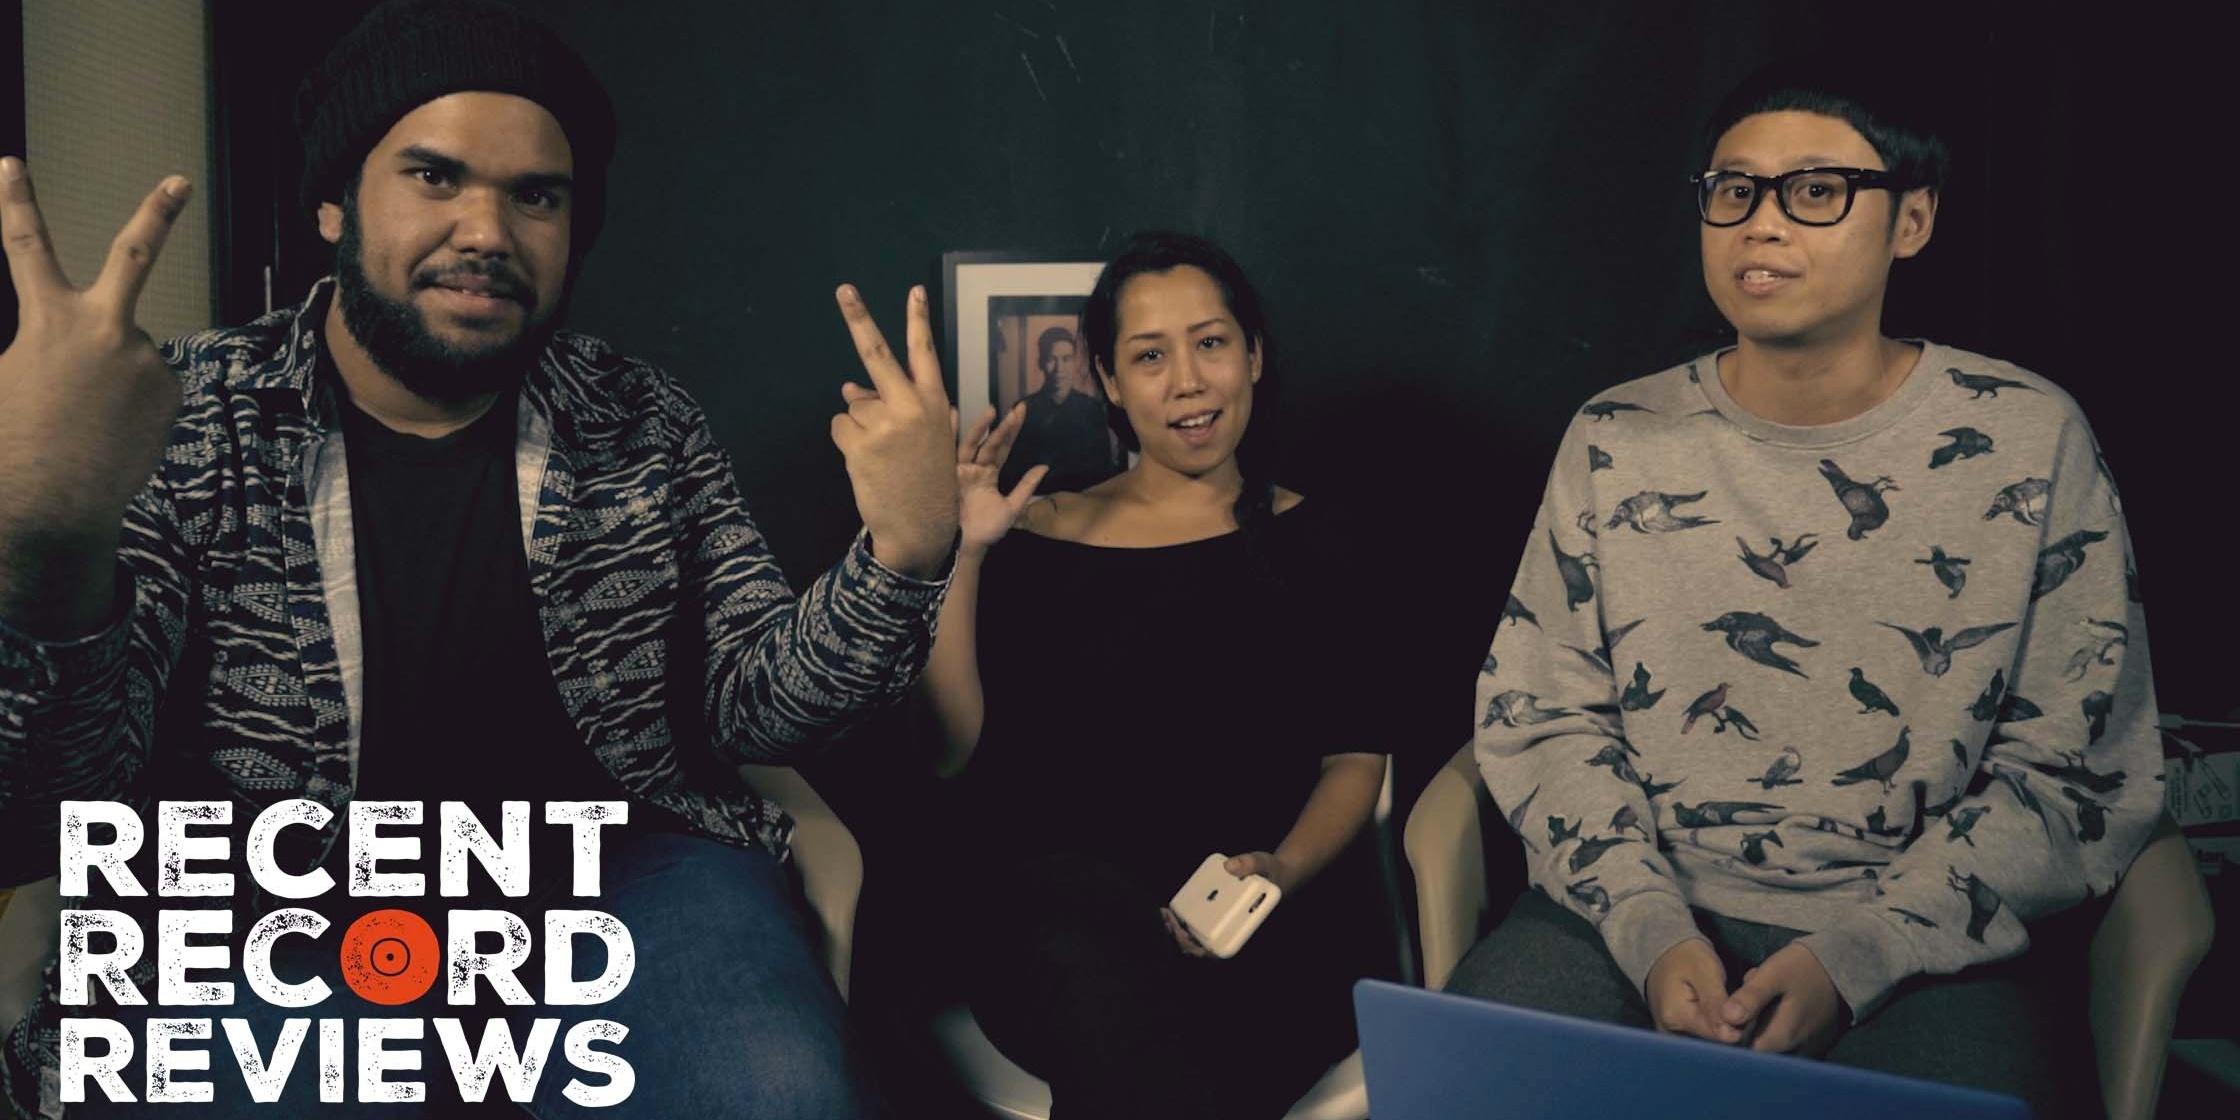 WATCH: Bandwagon Recent Record Reviews #016 - These Brittle Bones, Ash Koosha, DJ Rashad